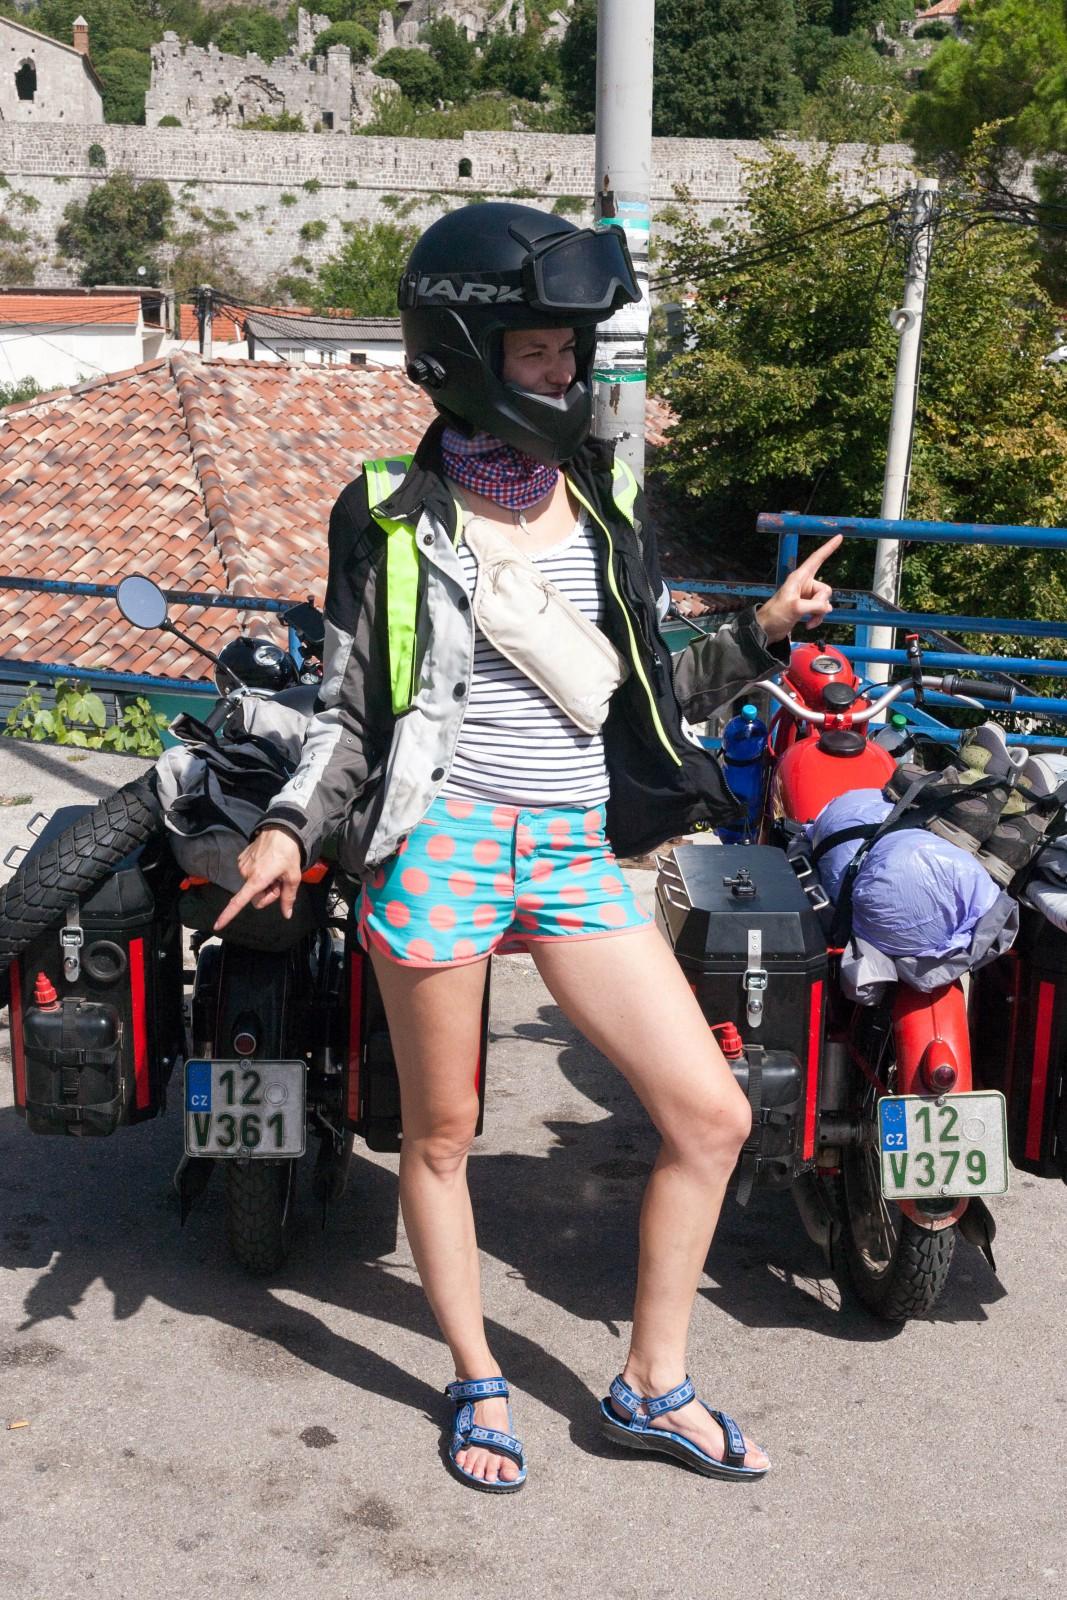 Motorkářská móda